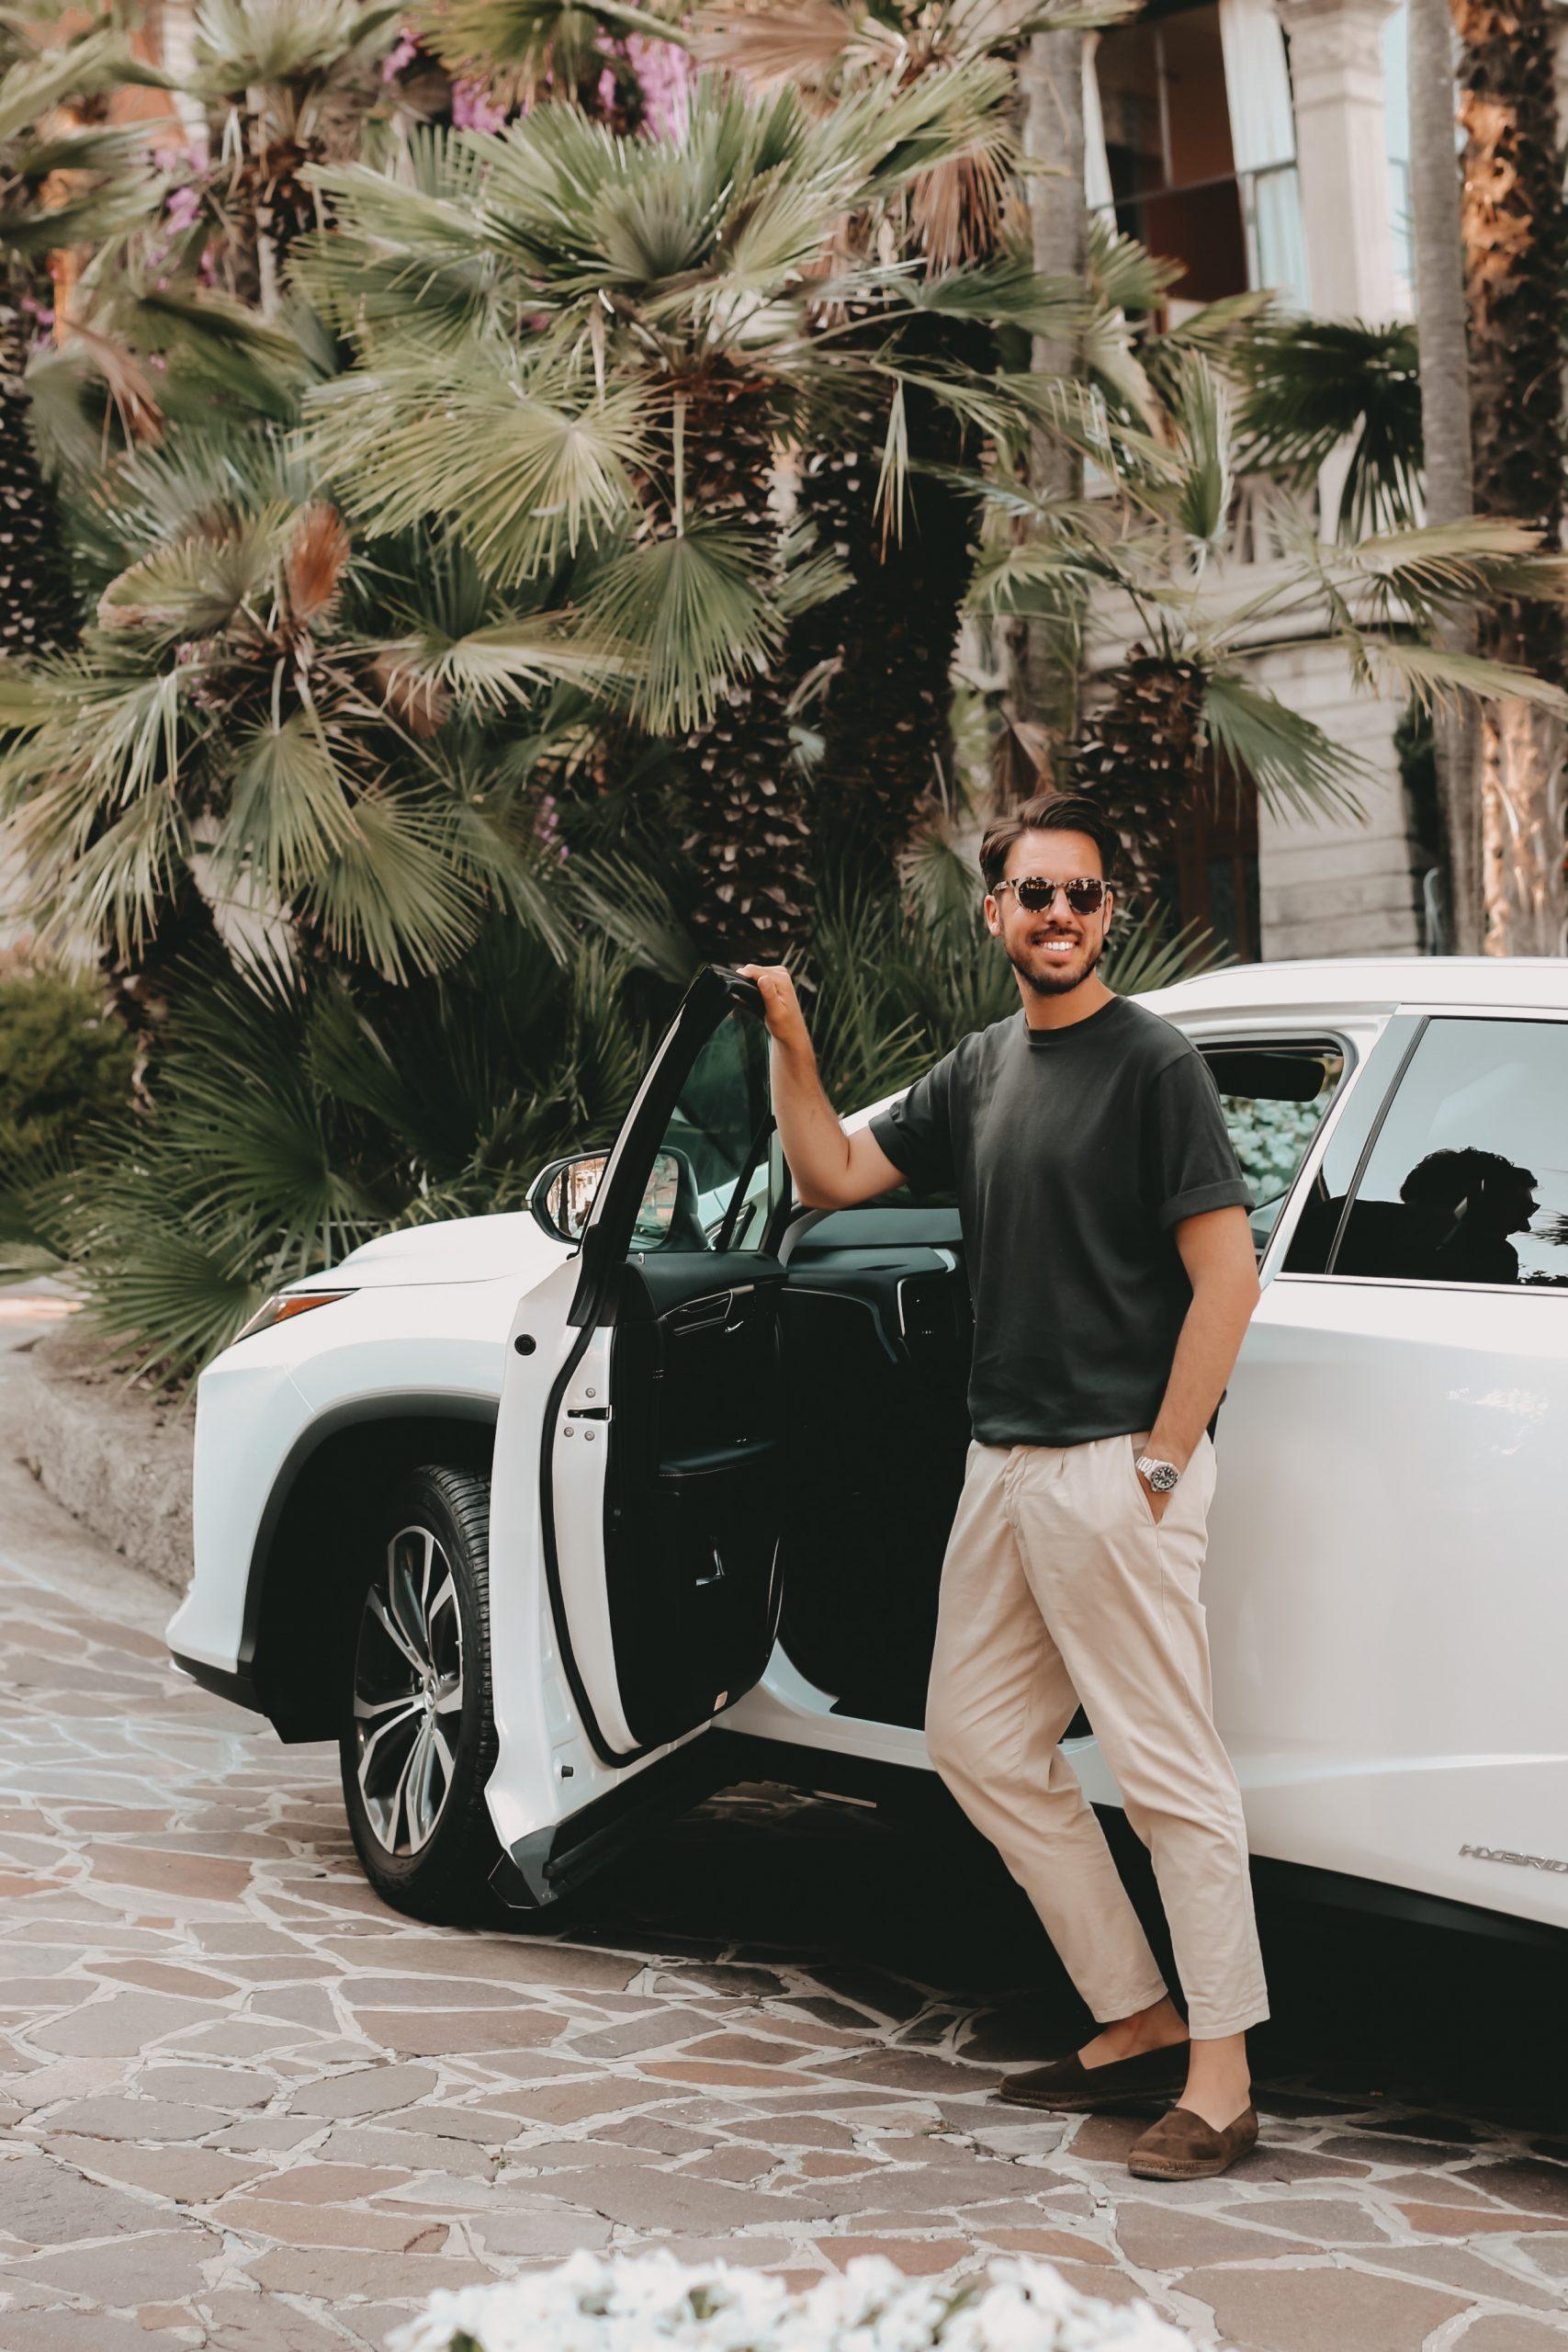 LexusRX-Sebastian-Schmidt